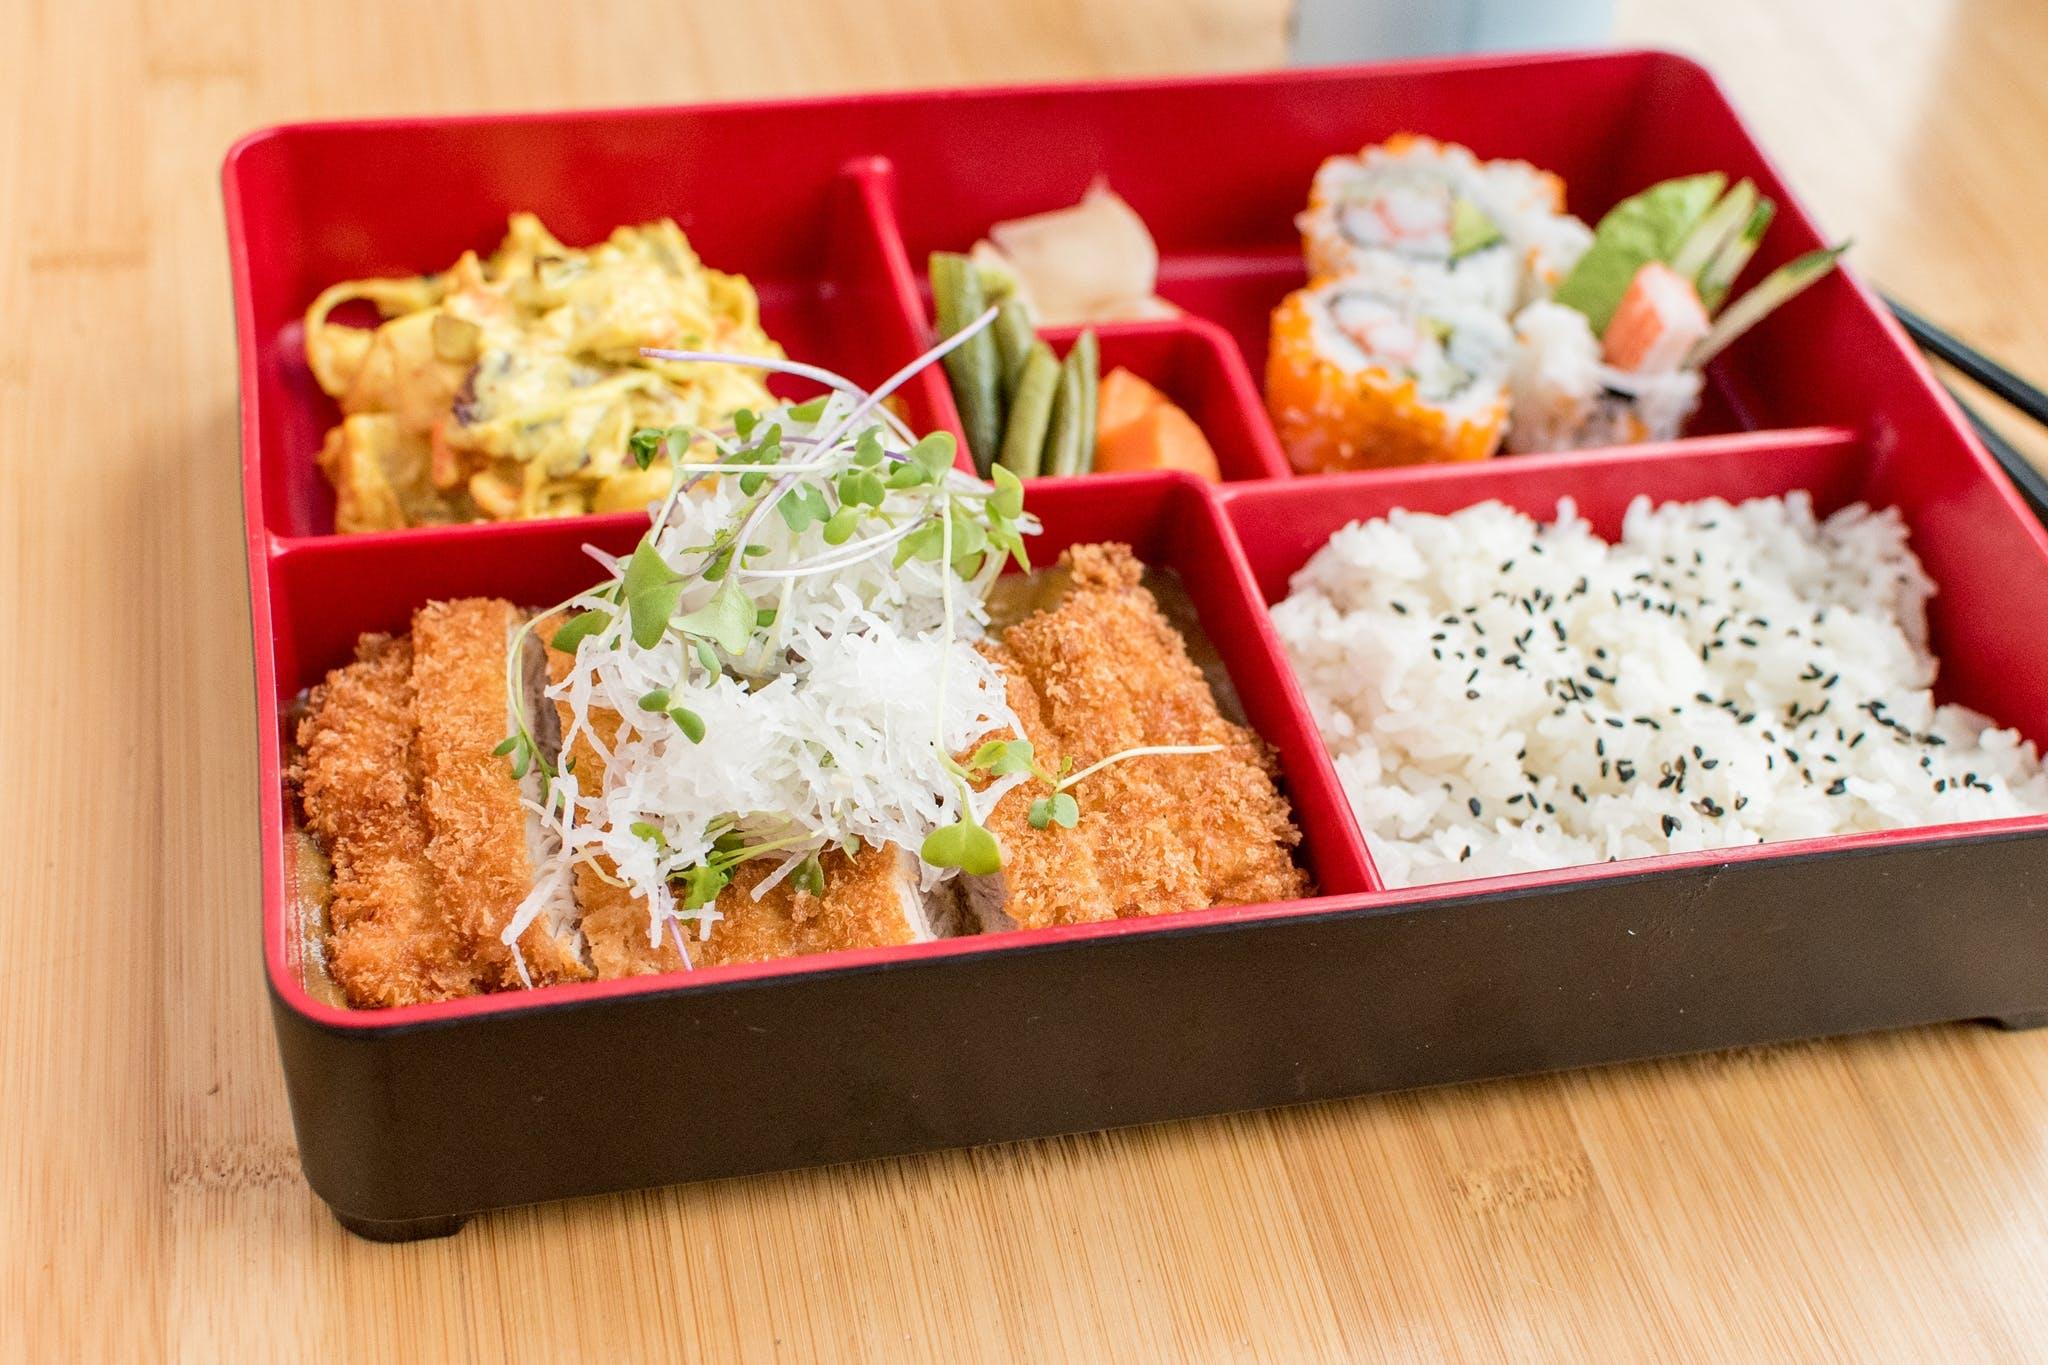 Curry Tofu Bento Box from Tavernakaya in Madison, WI